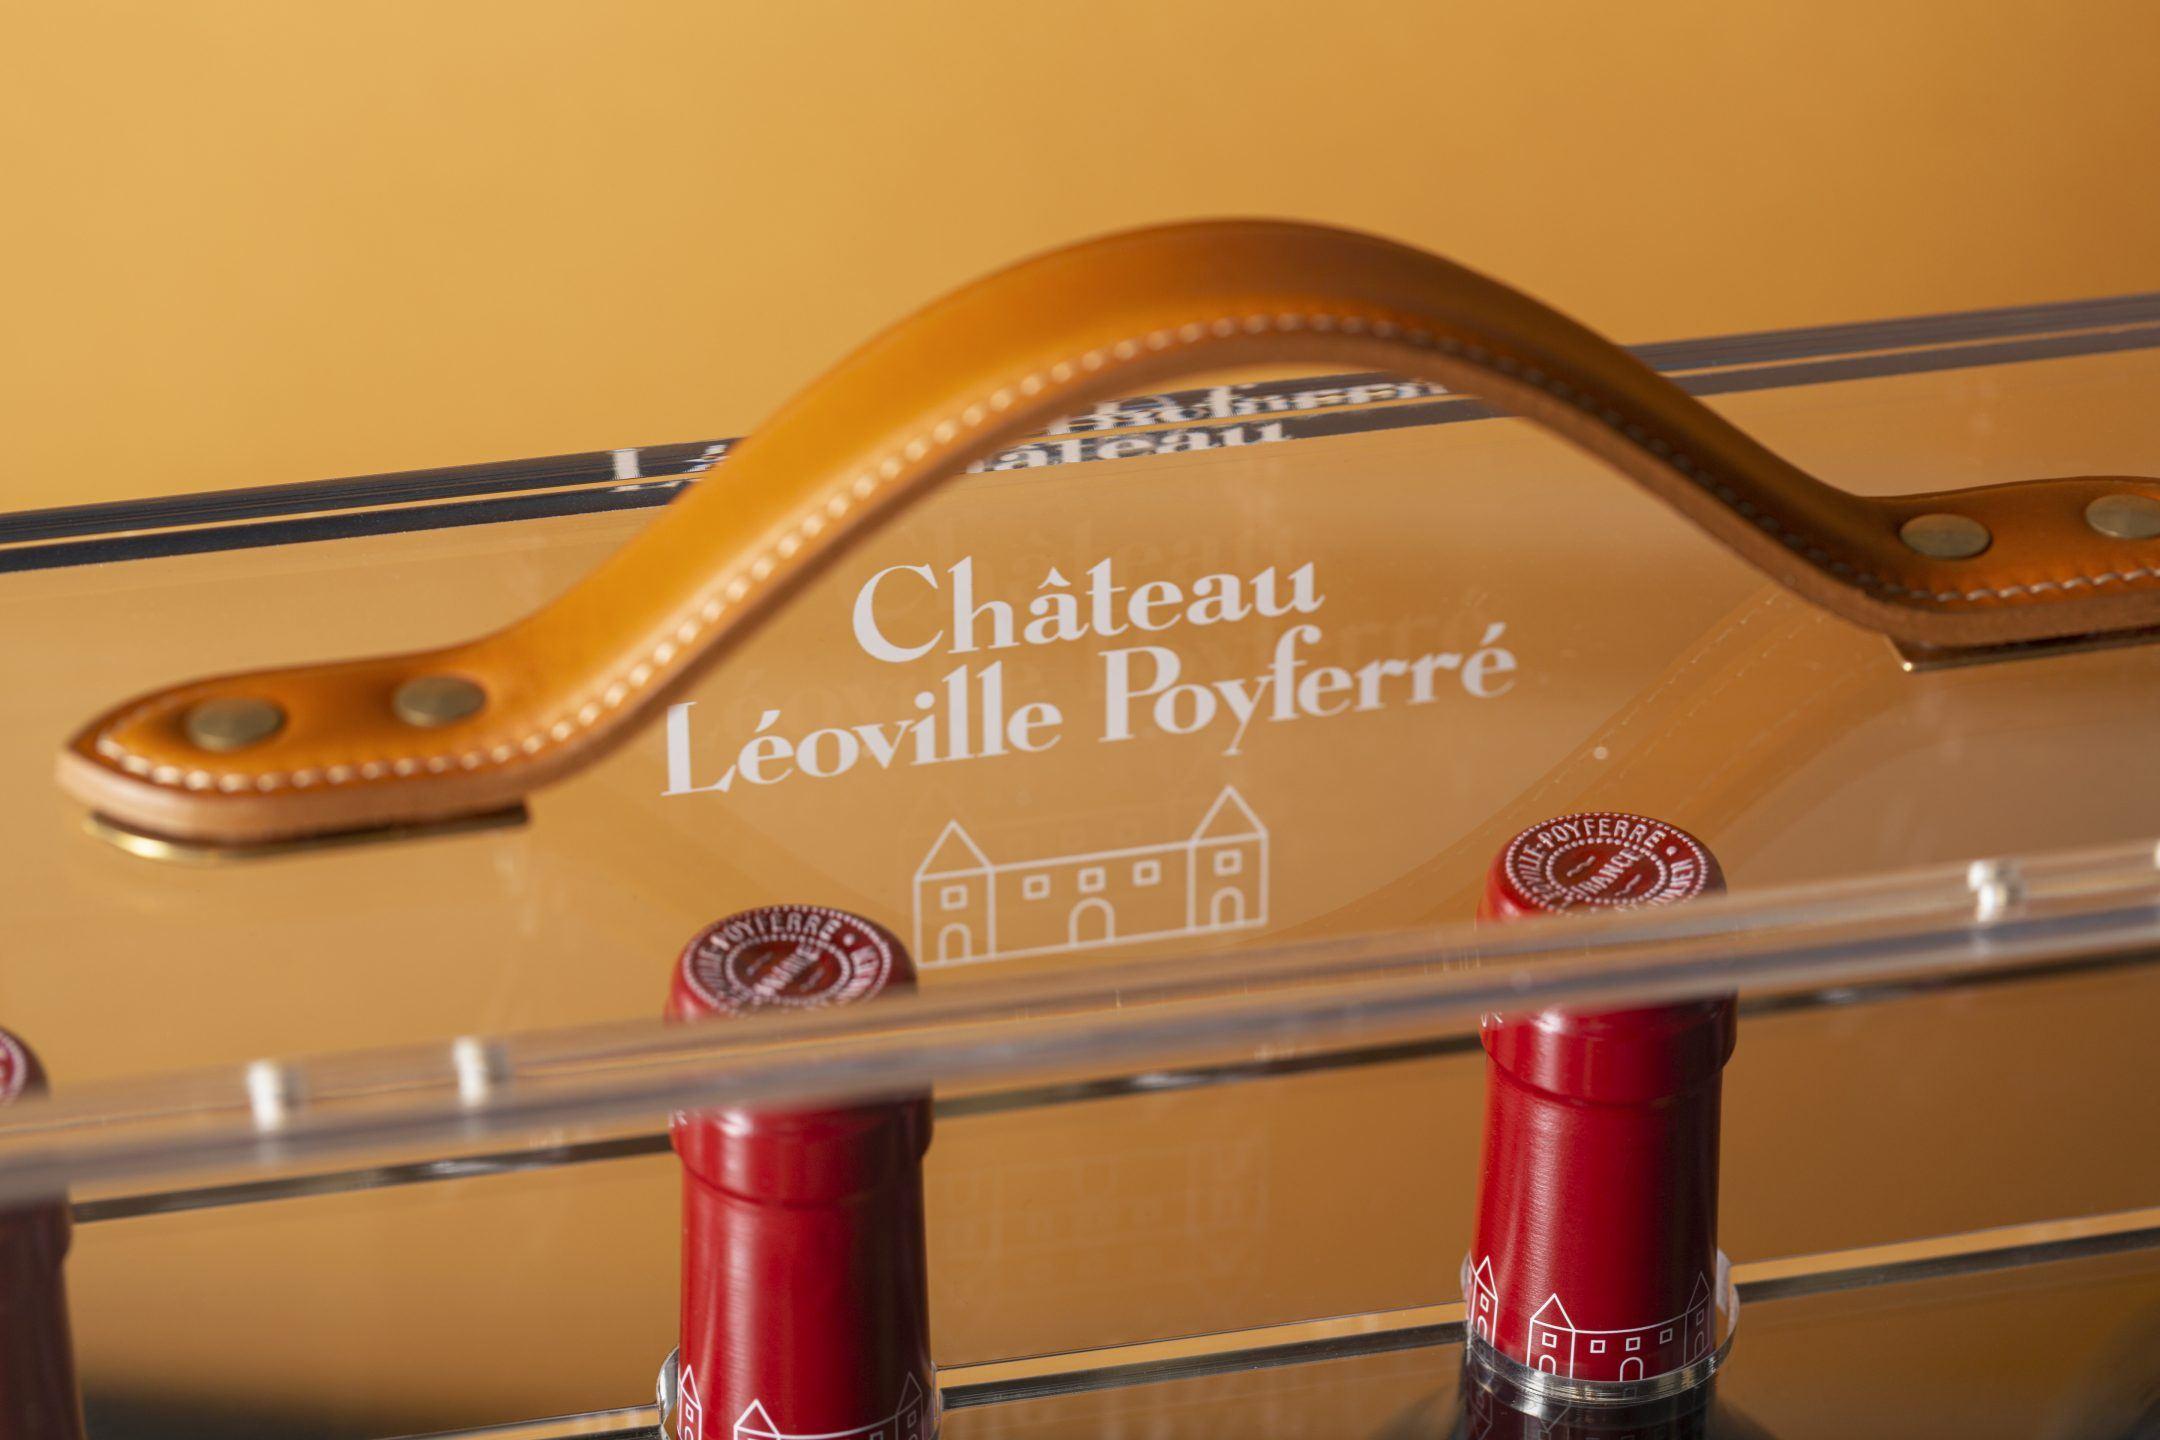 Signature case - Léoville Poyferré